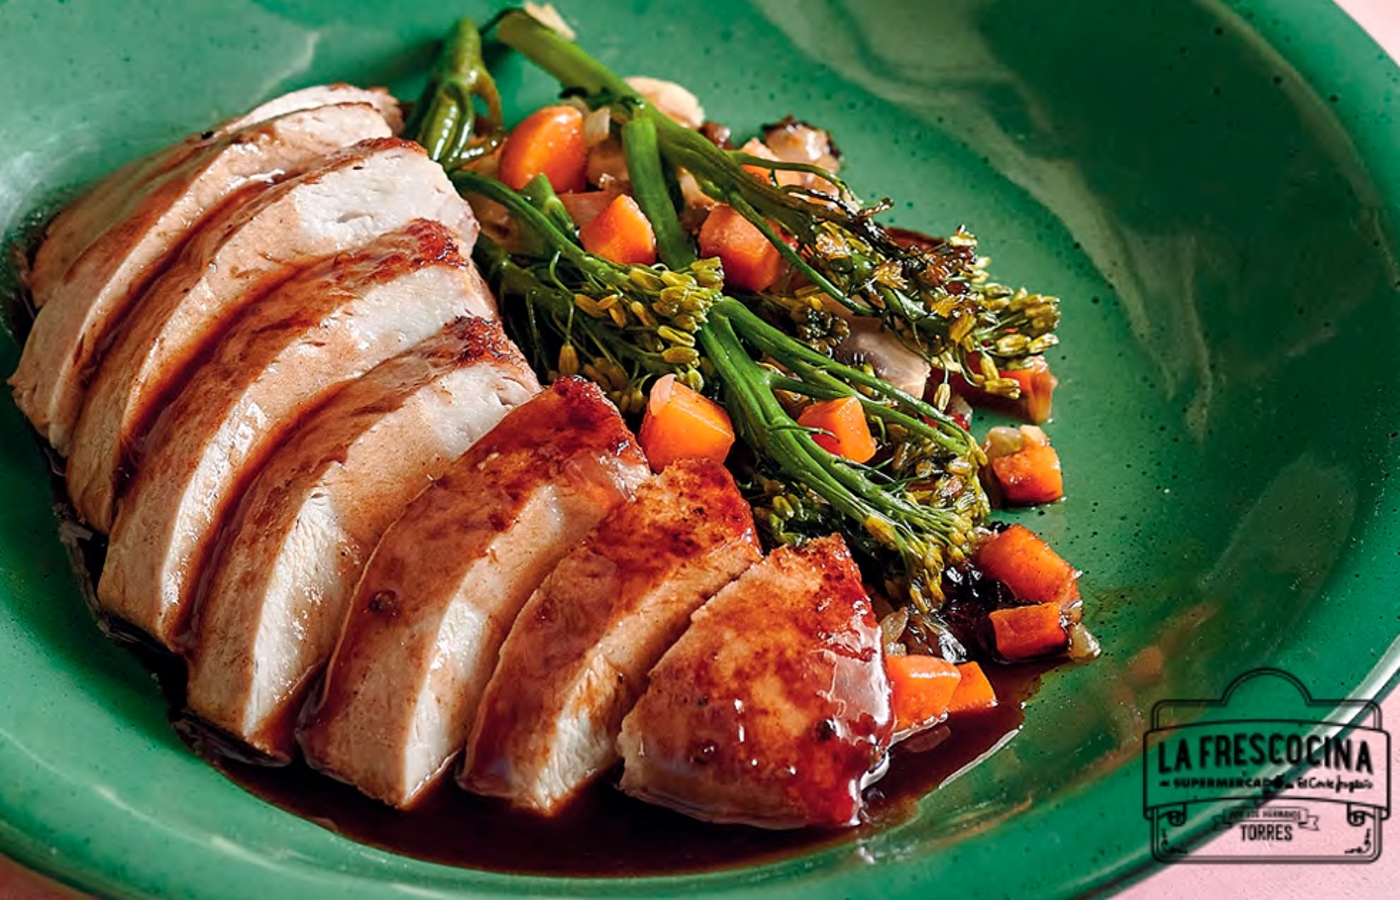 Solomillo de pavo con verduras y salsa oporto